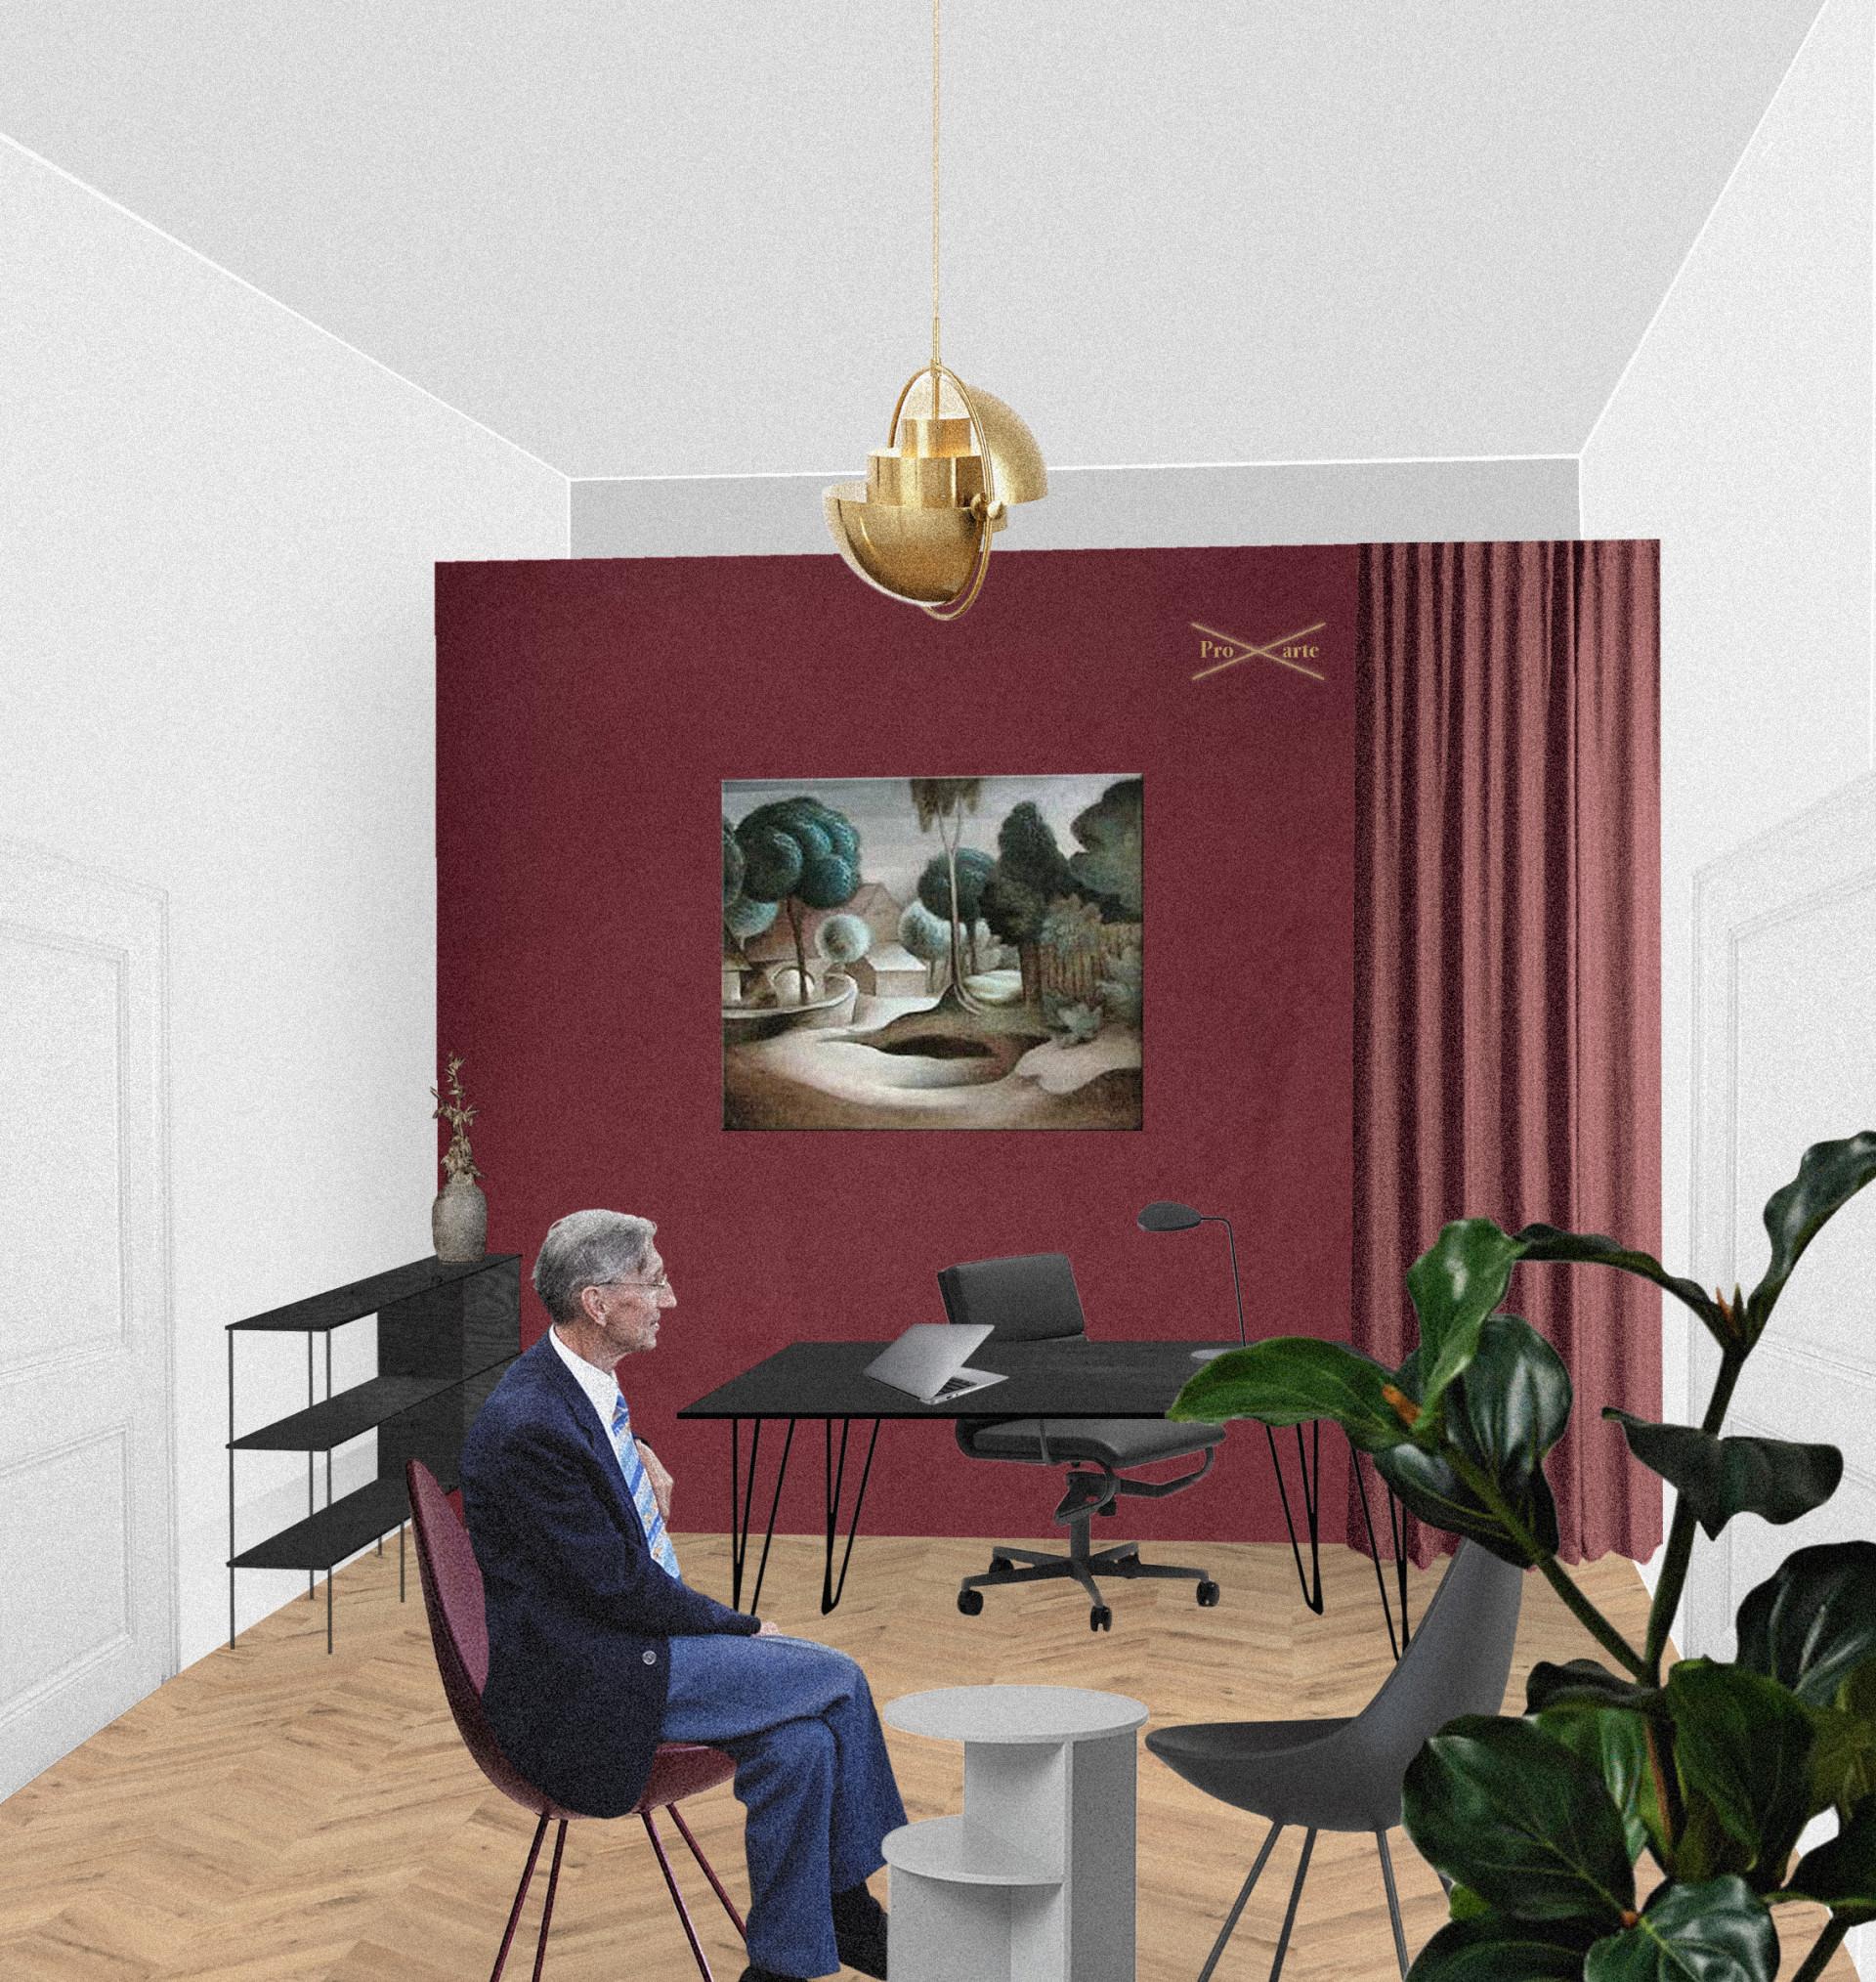 Denisa Strmiskova Studio | spatial design PRO ARTE